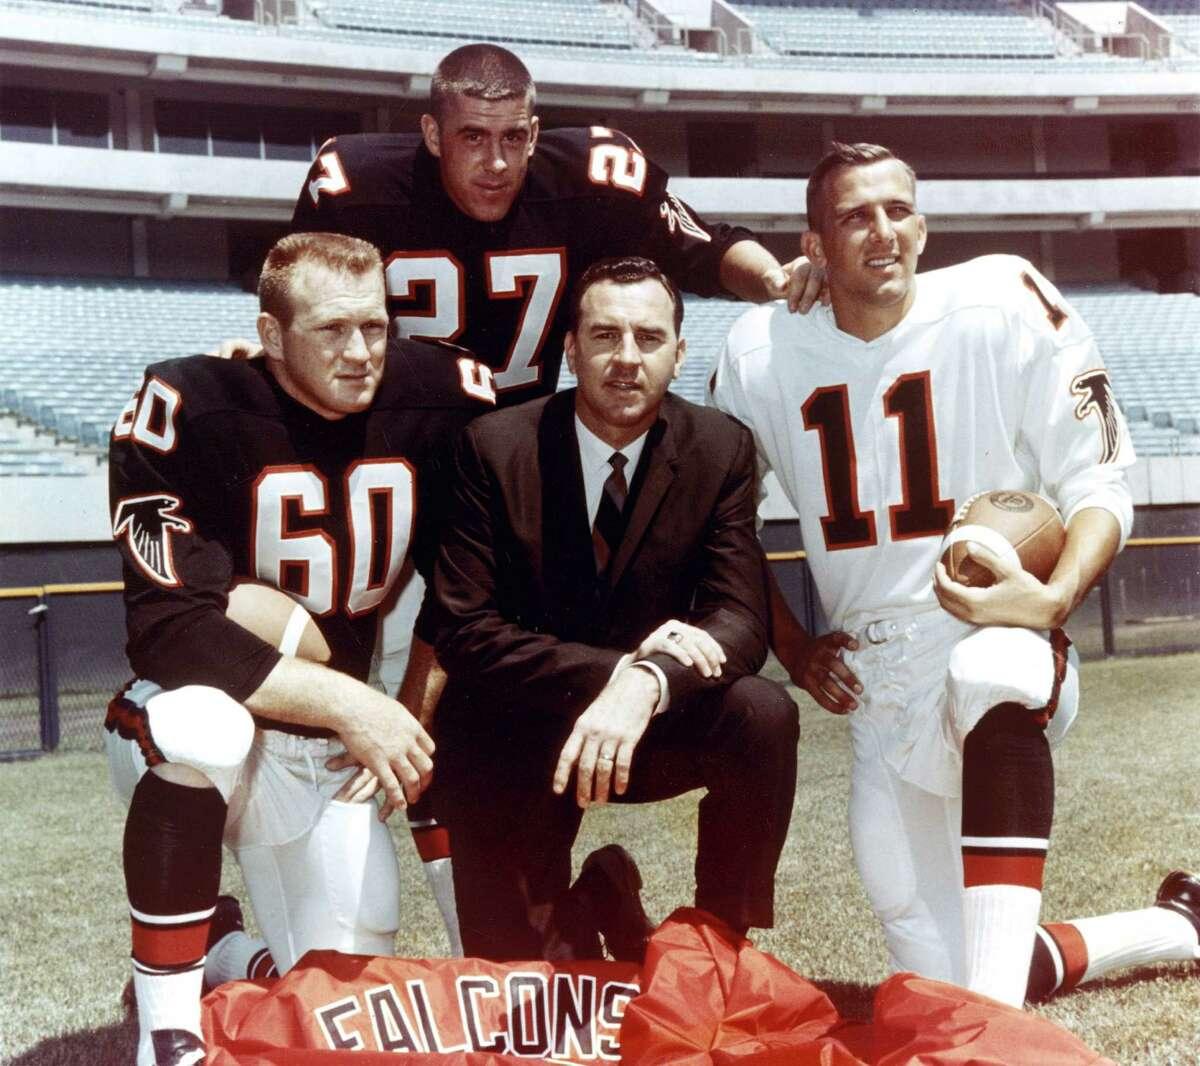 Falcons' inaugural season: 1966 (NFL) Falcons' all-time record:341-437-6 (9-12 playoffs) Falcons' Super Bowl record:0-1